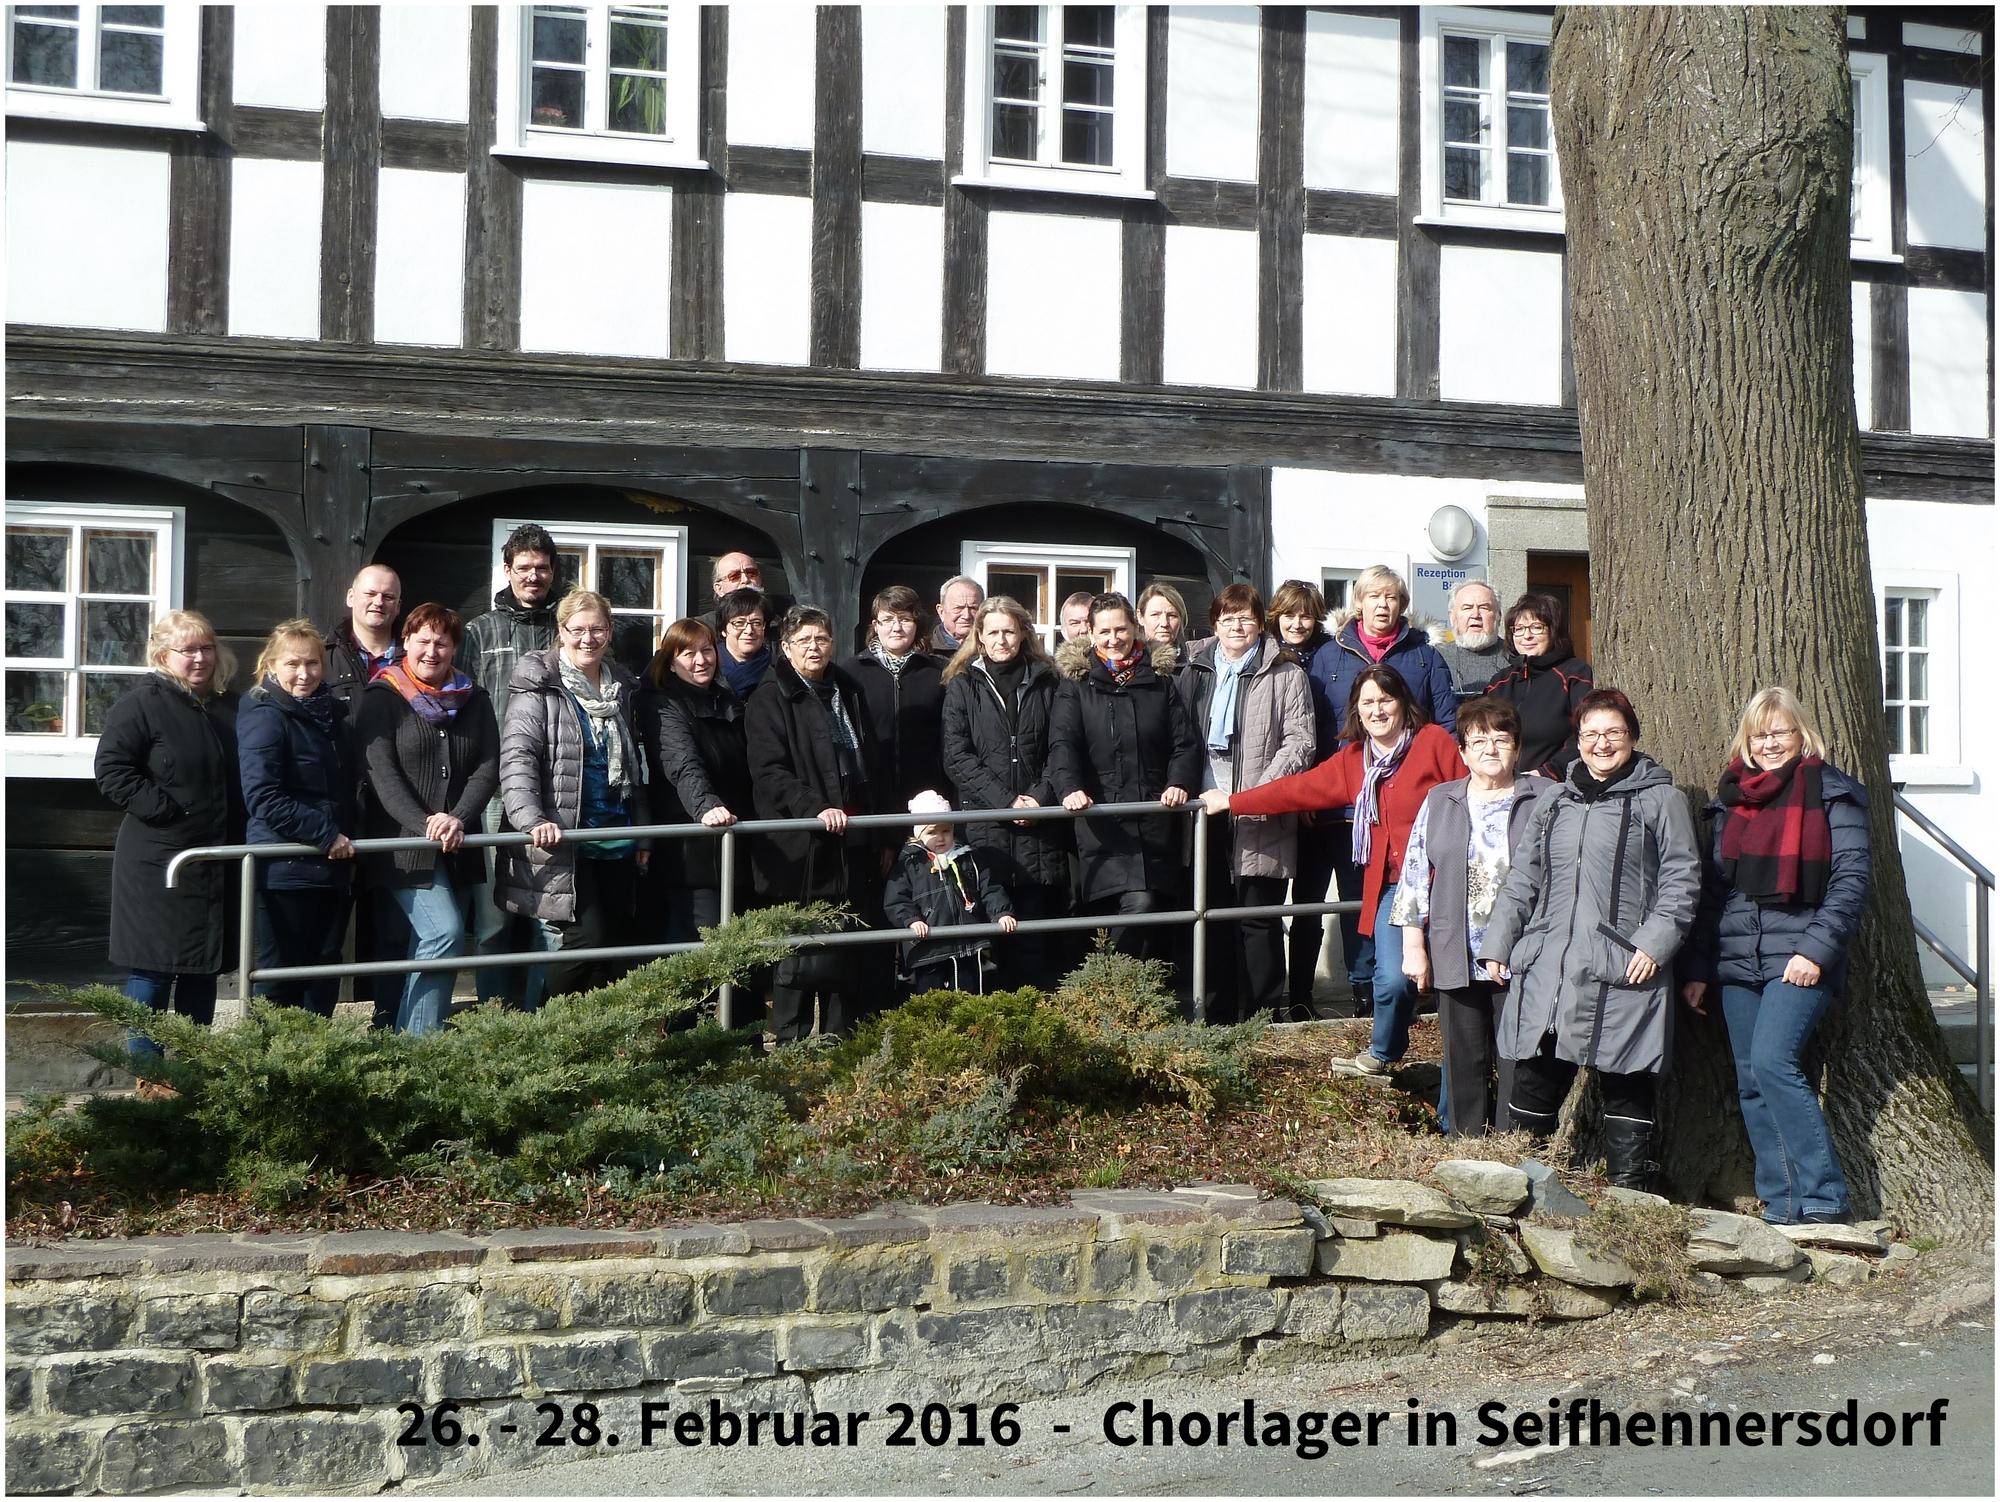 Chorlager in Seifhennersdorf